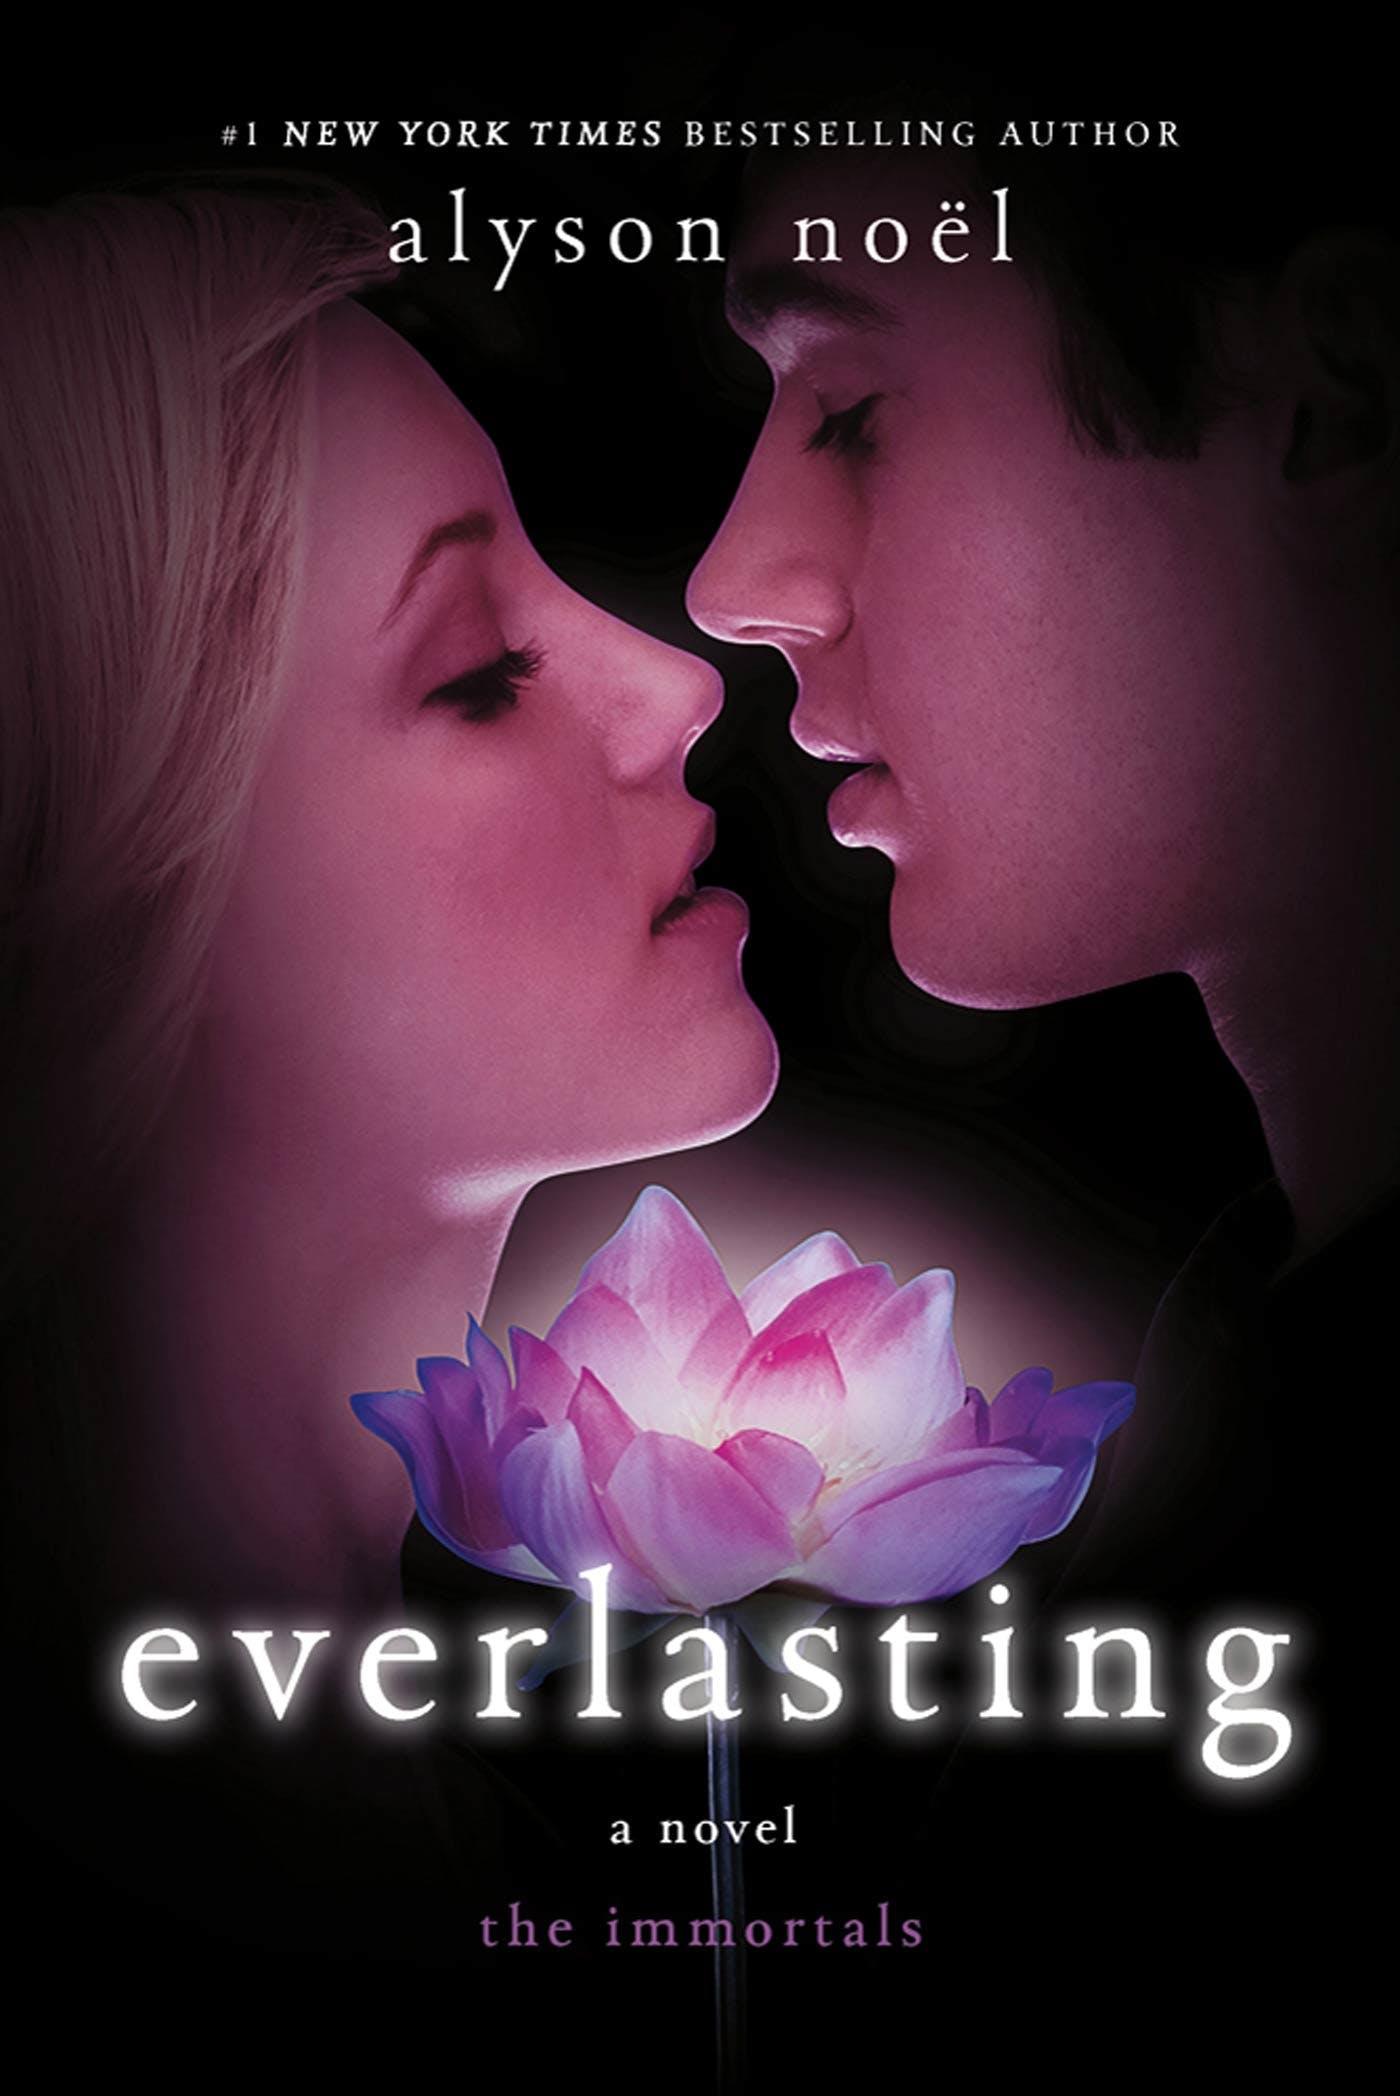 Image of Everlasting